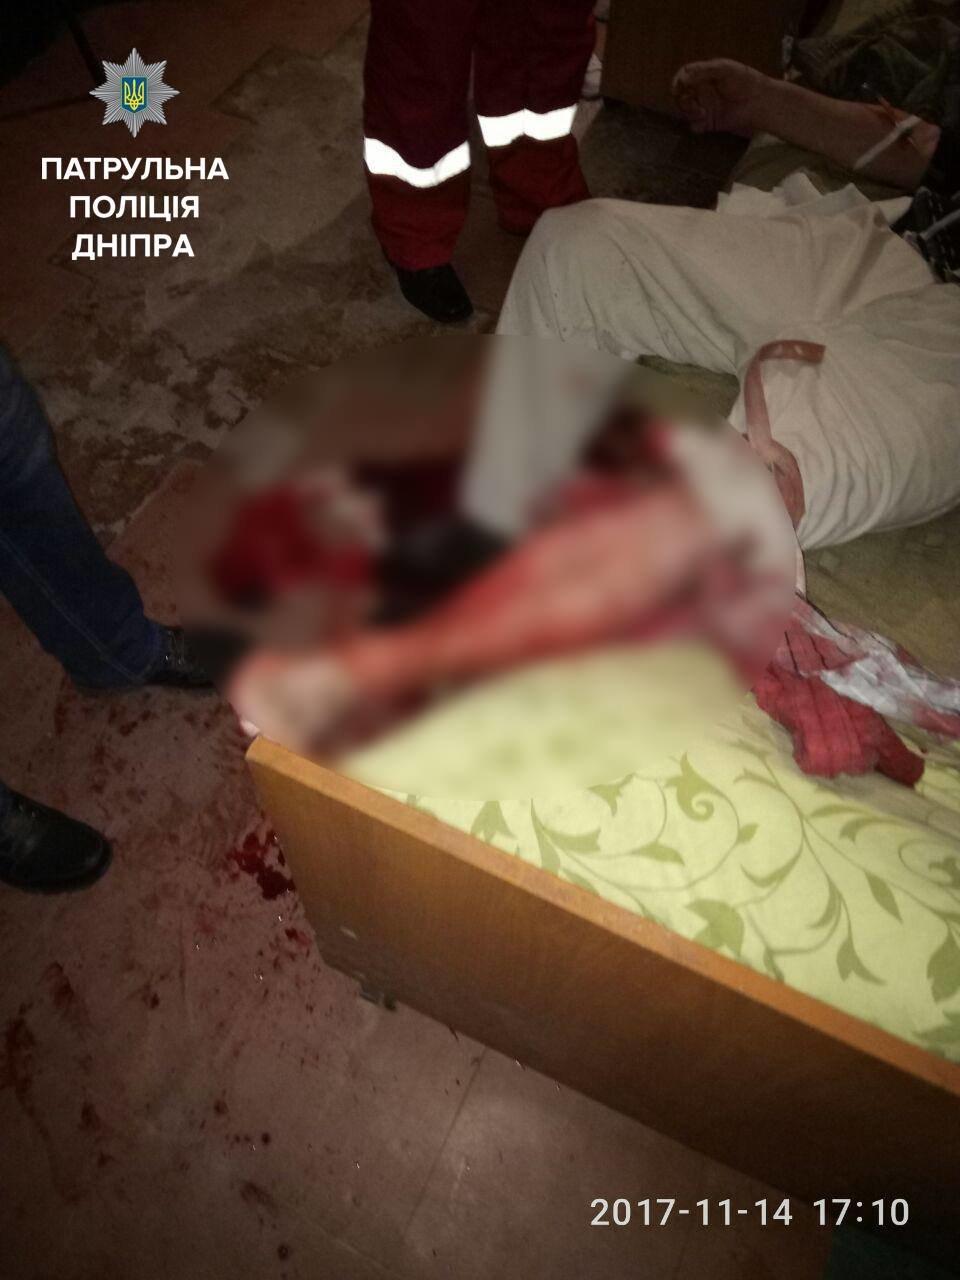 В Днепре порезали жильца гериатрического пансионата (ФОТО), фото-3